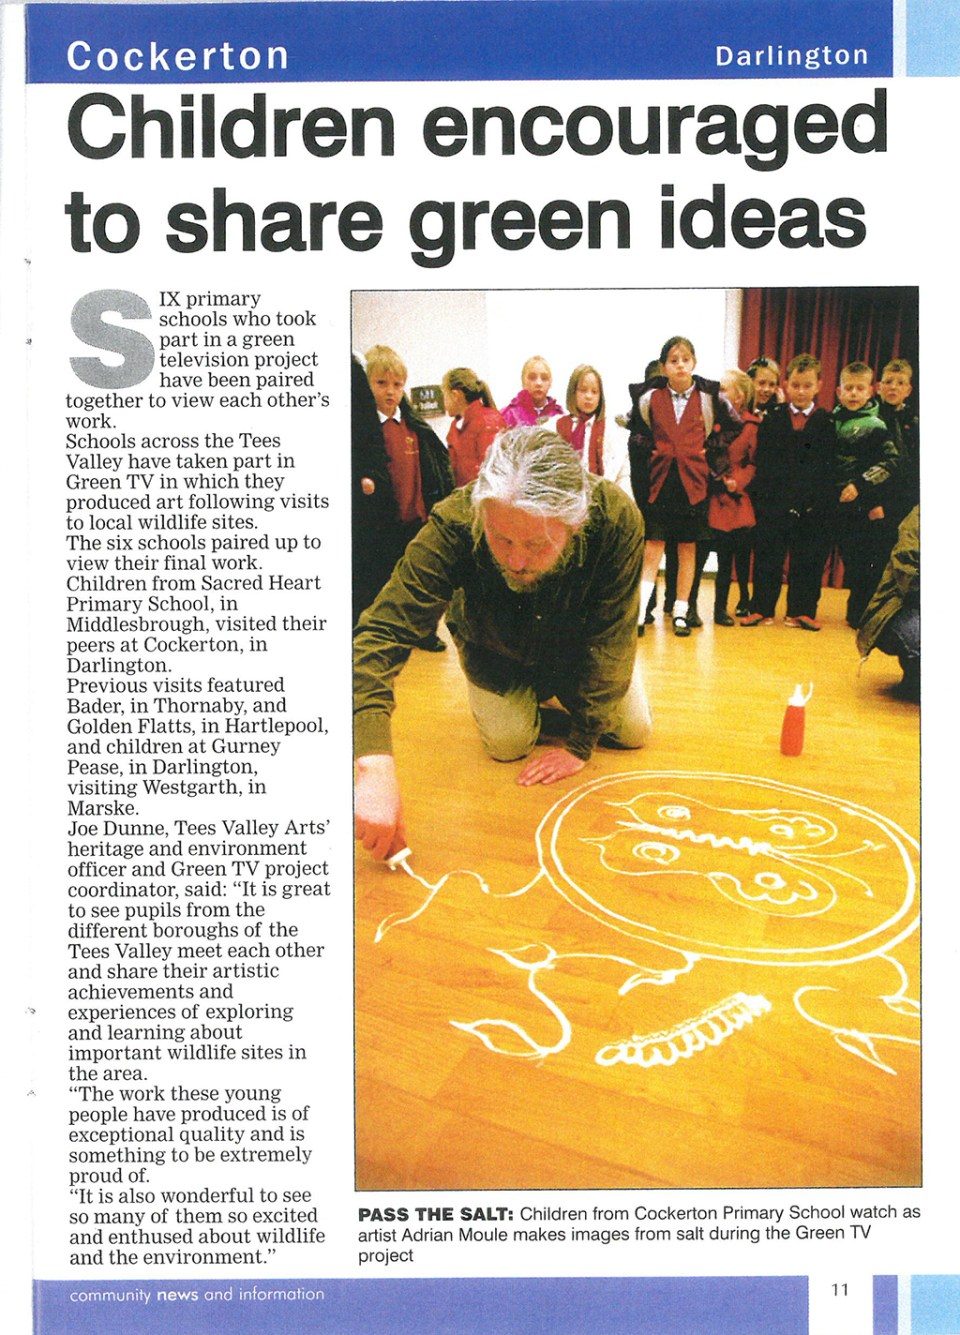 2011- Darlington Dispatch, Children encouraged to share green ideas